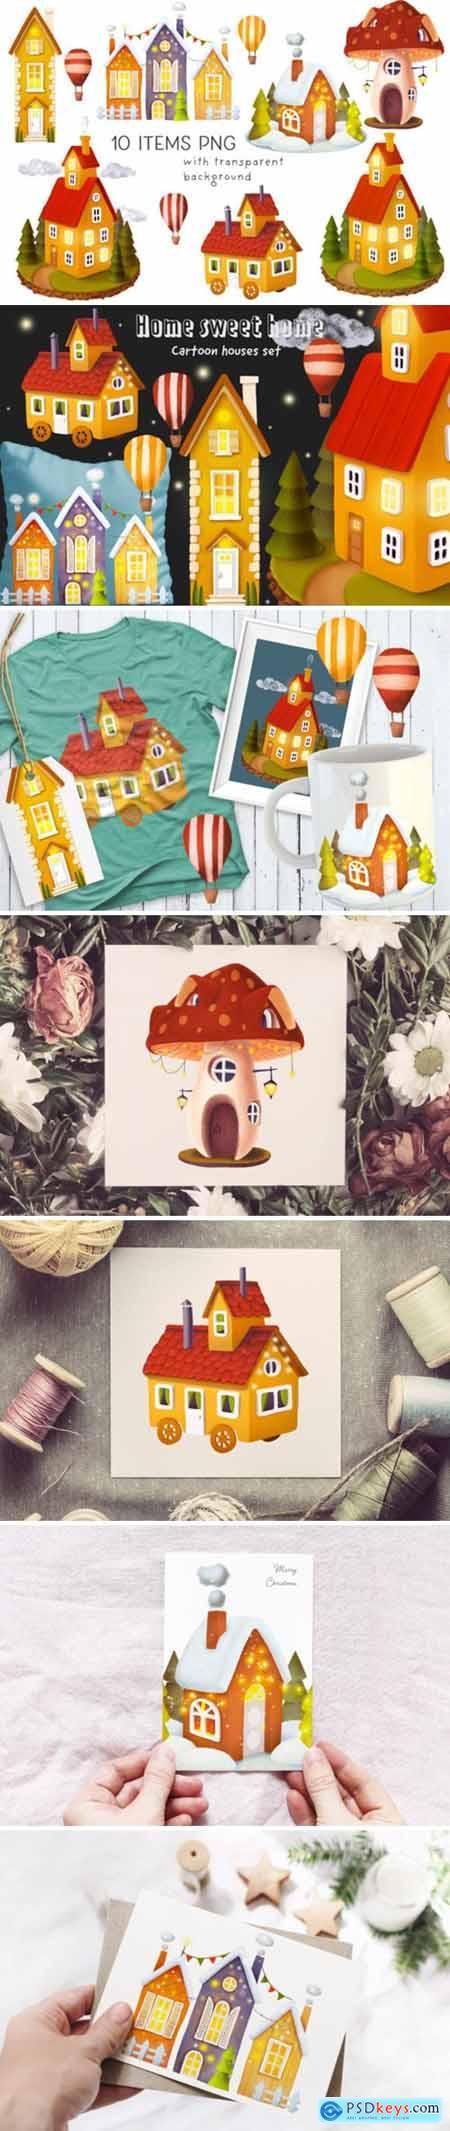 House Illustrations Set 2197126